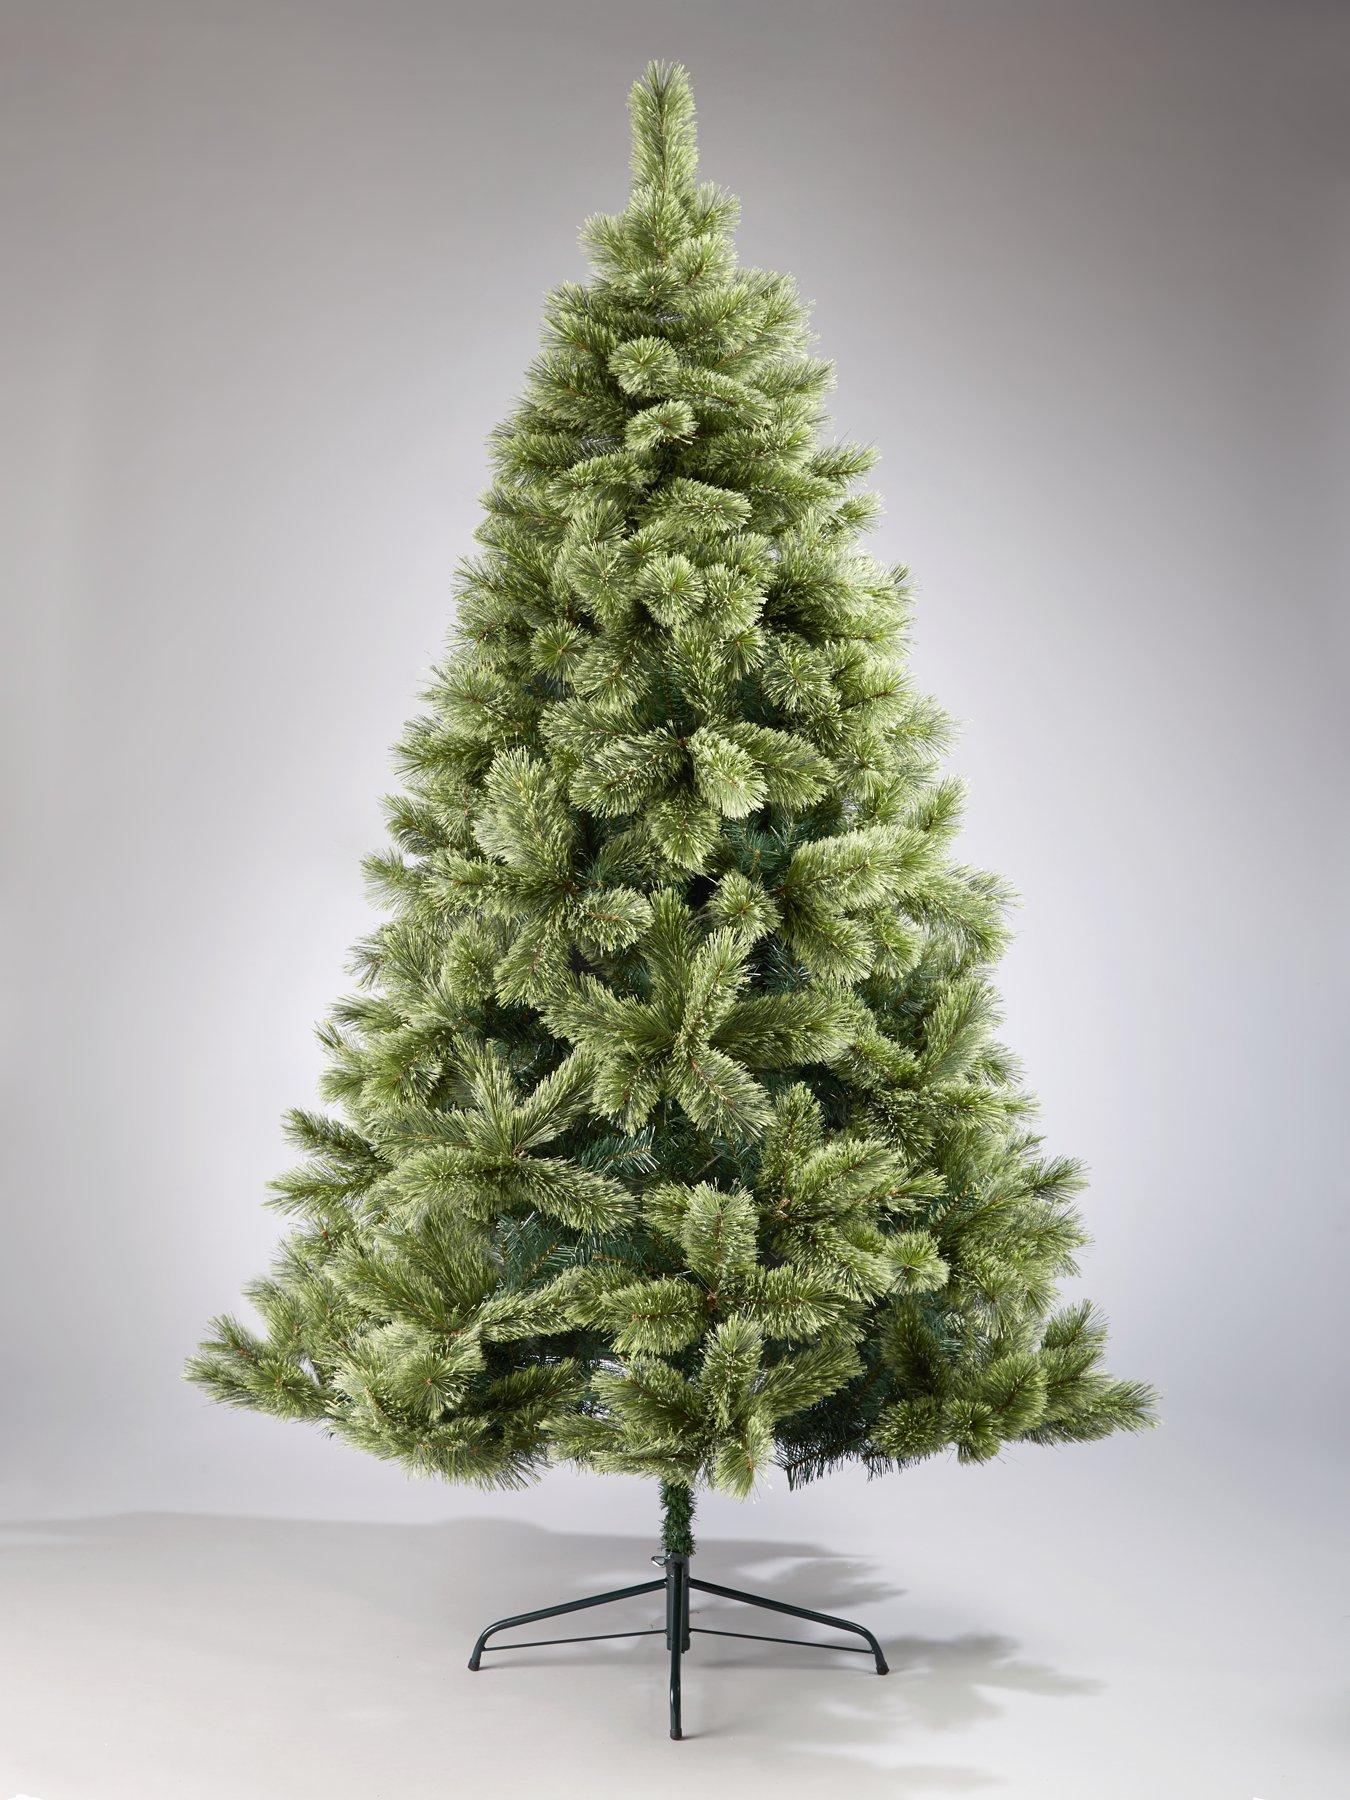 Styrofoam clear trees cone decor,Christmas DIY,sizes 12cm,15cm,20cm,26 cm,40cm!!